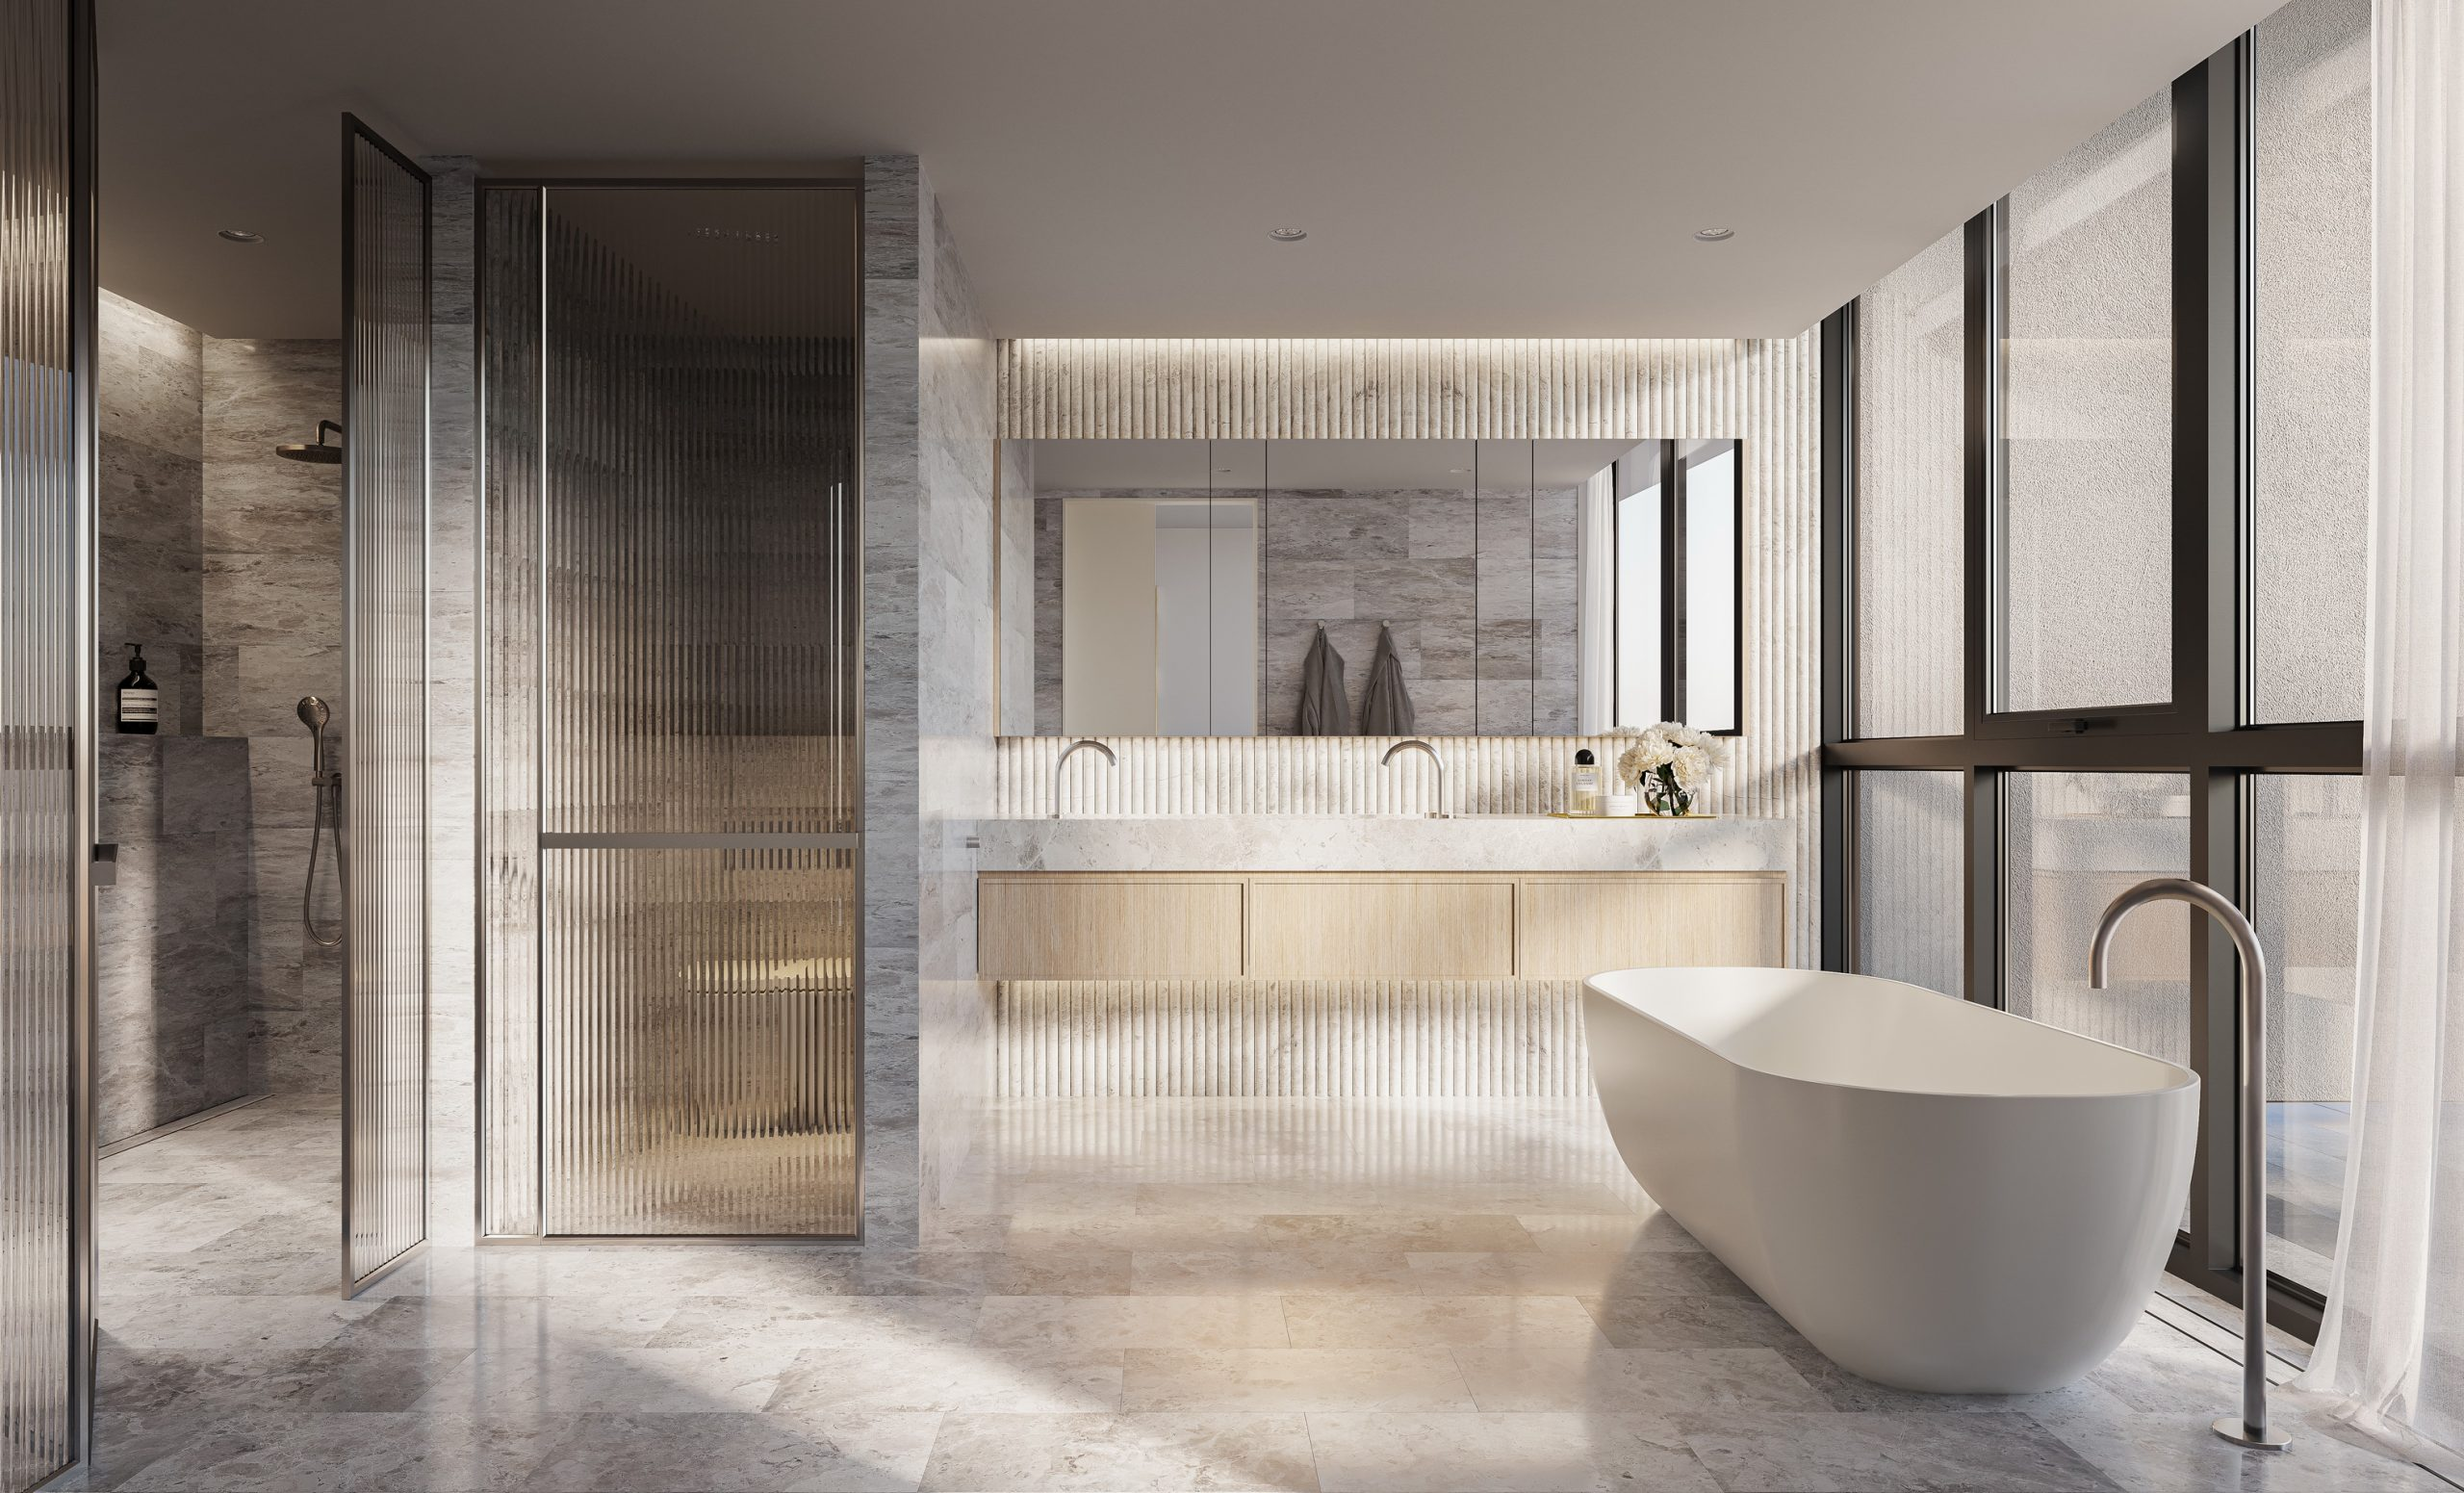 Rivello-queensland-render-3d-fkd-studio-architecture-luxury-interior-design